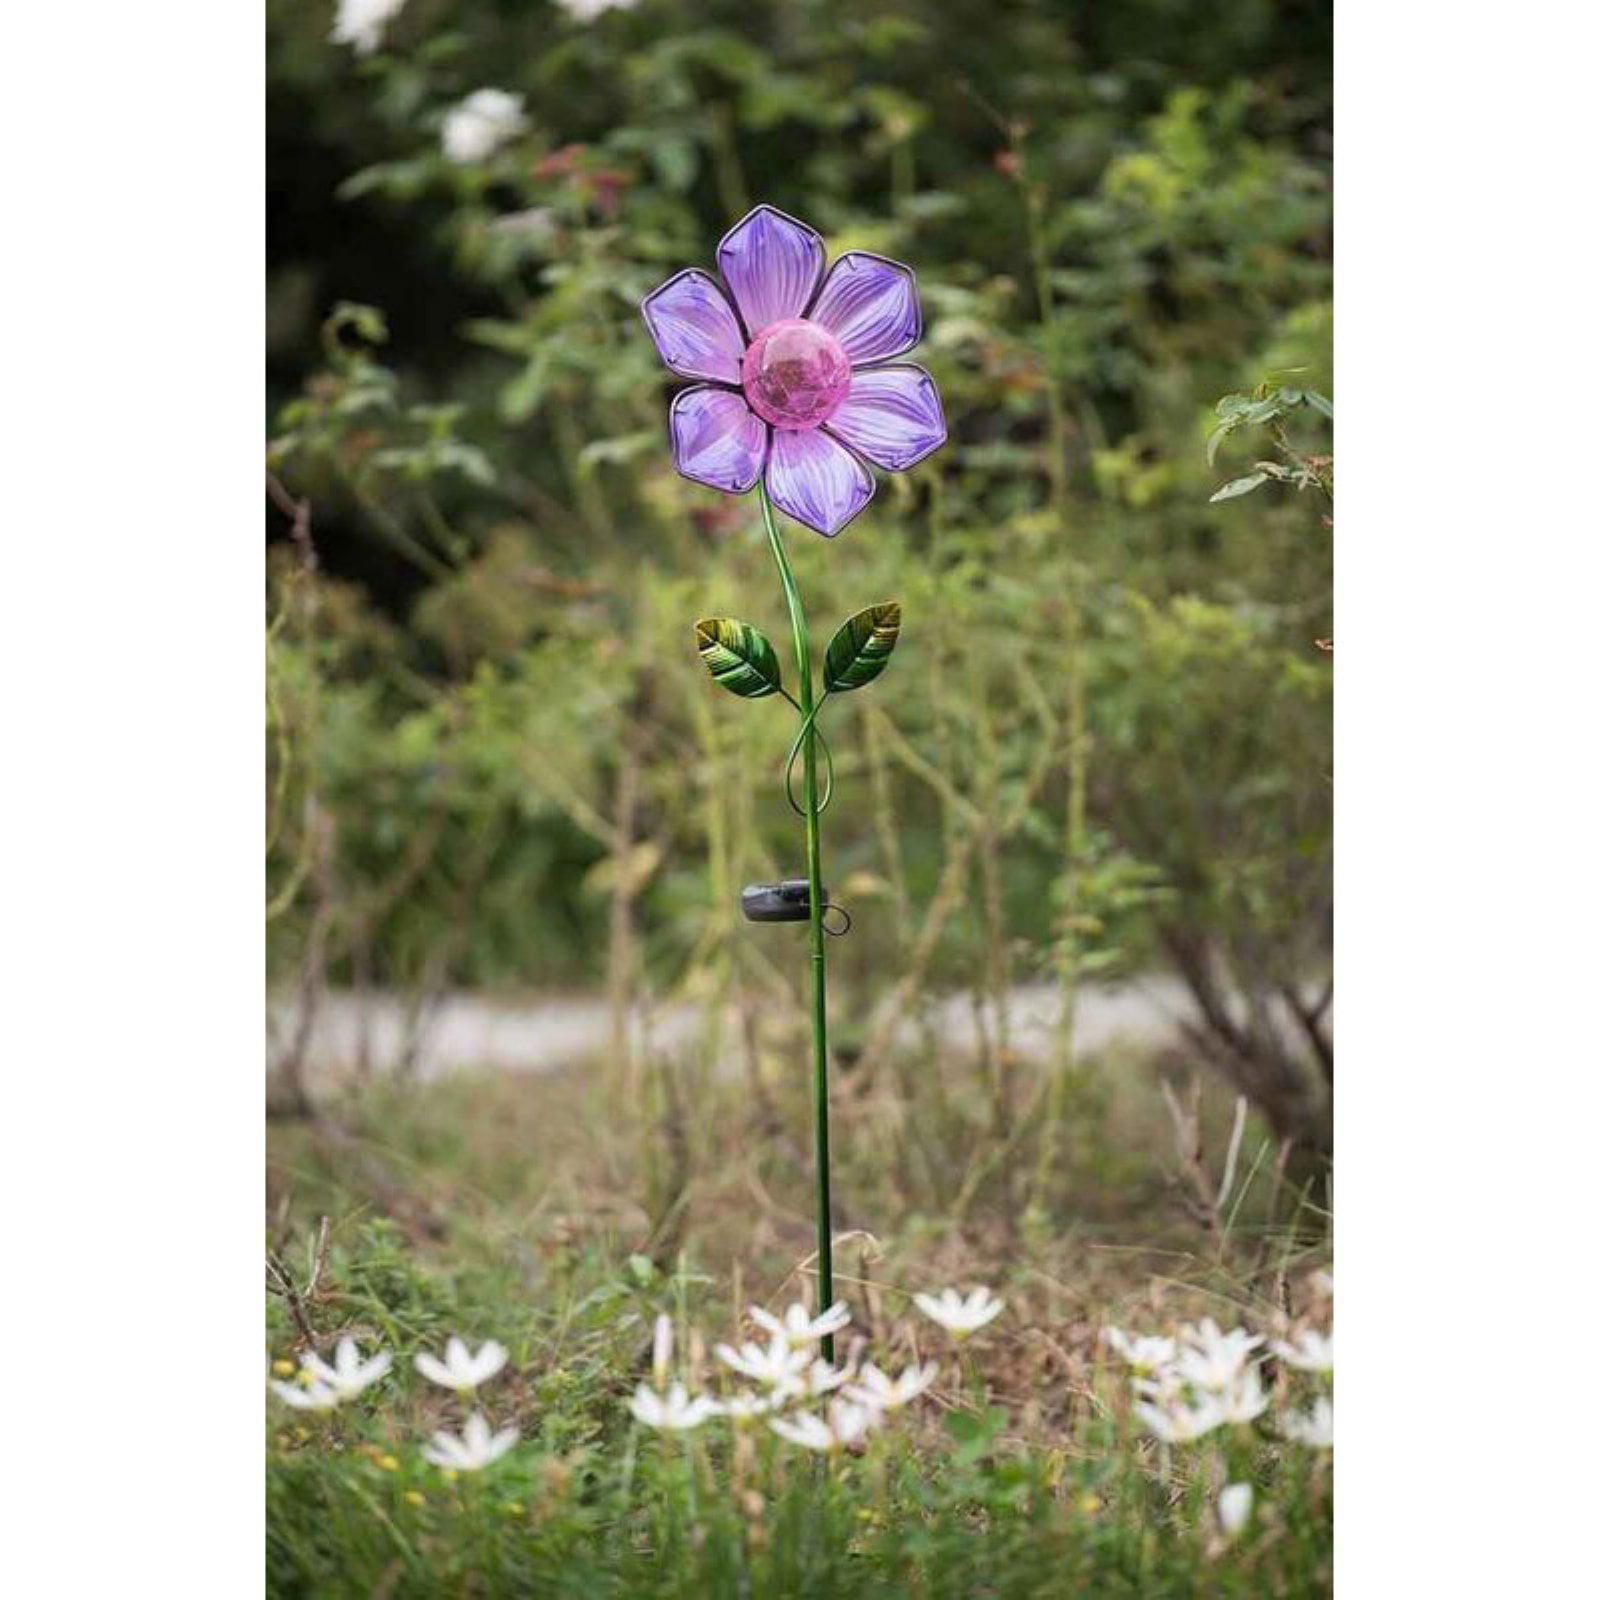 Sunjoy Blue Flower Garden Stake w/ LED Solar